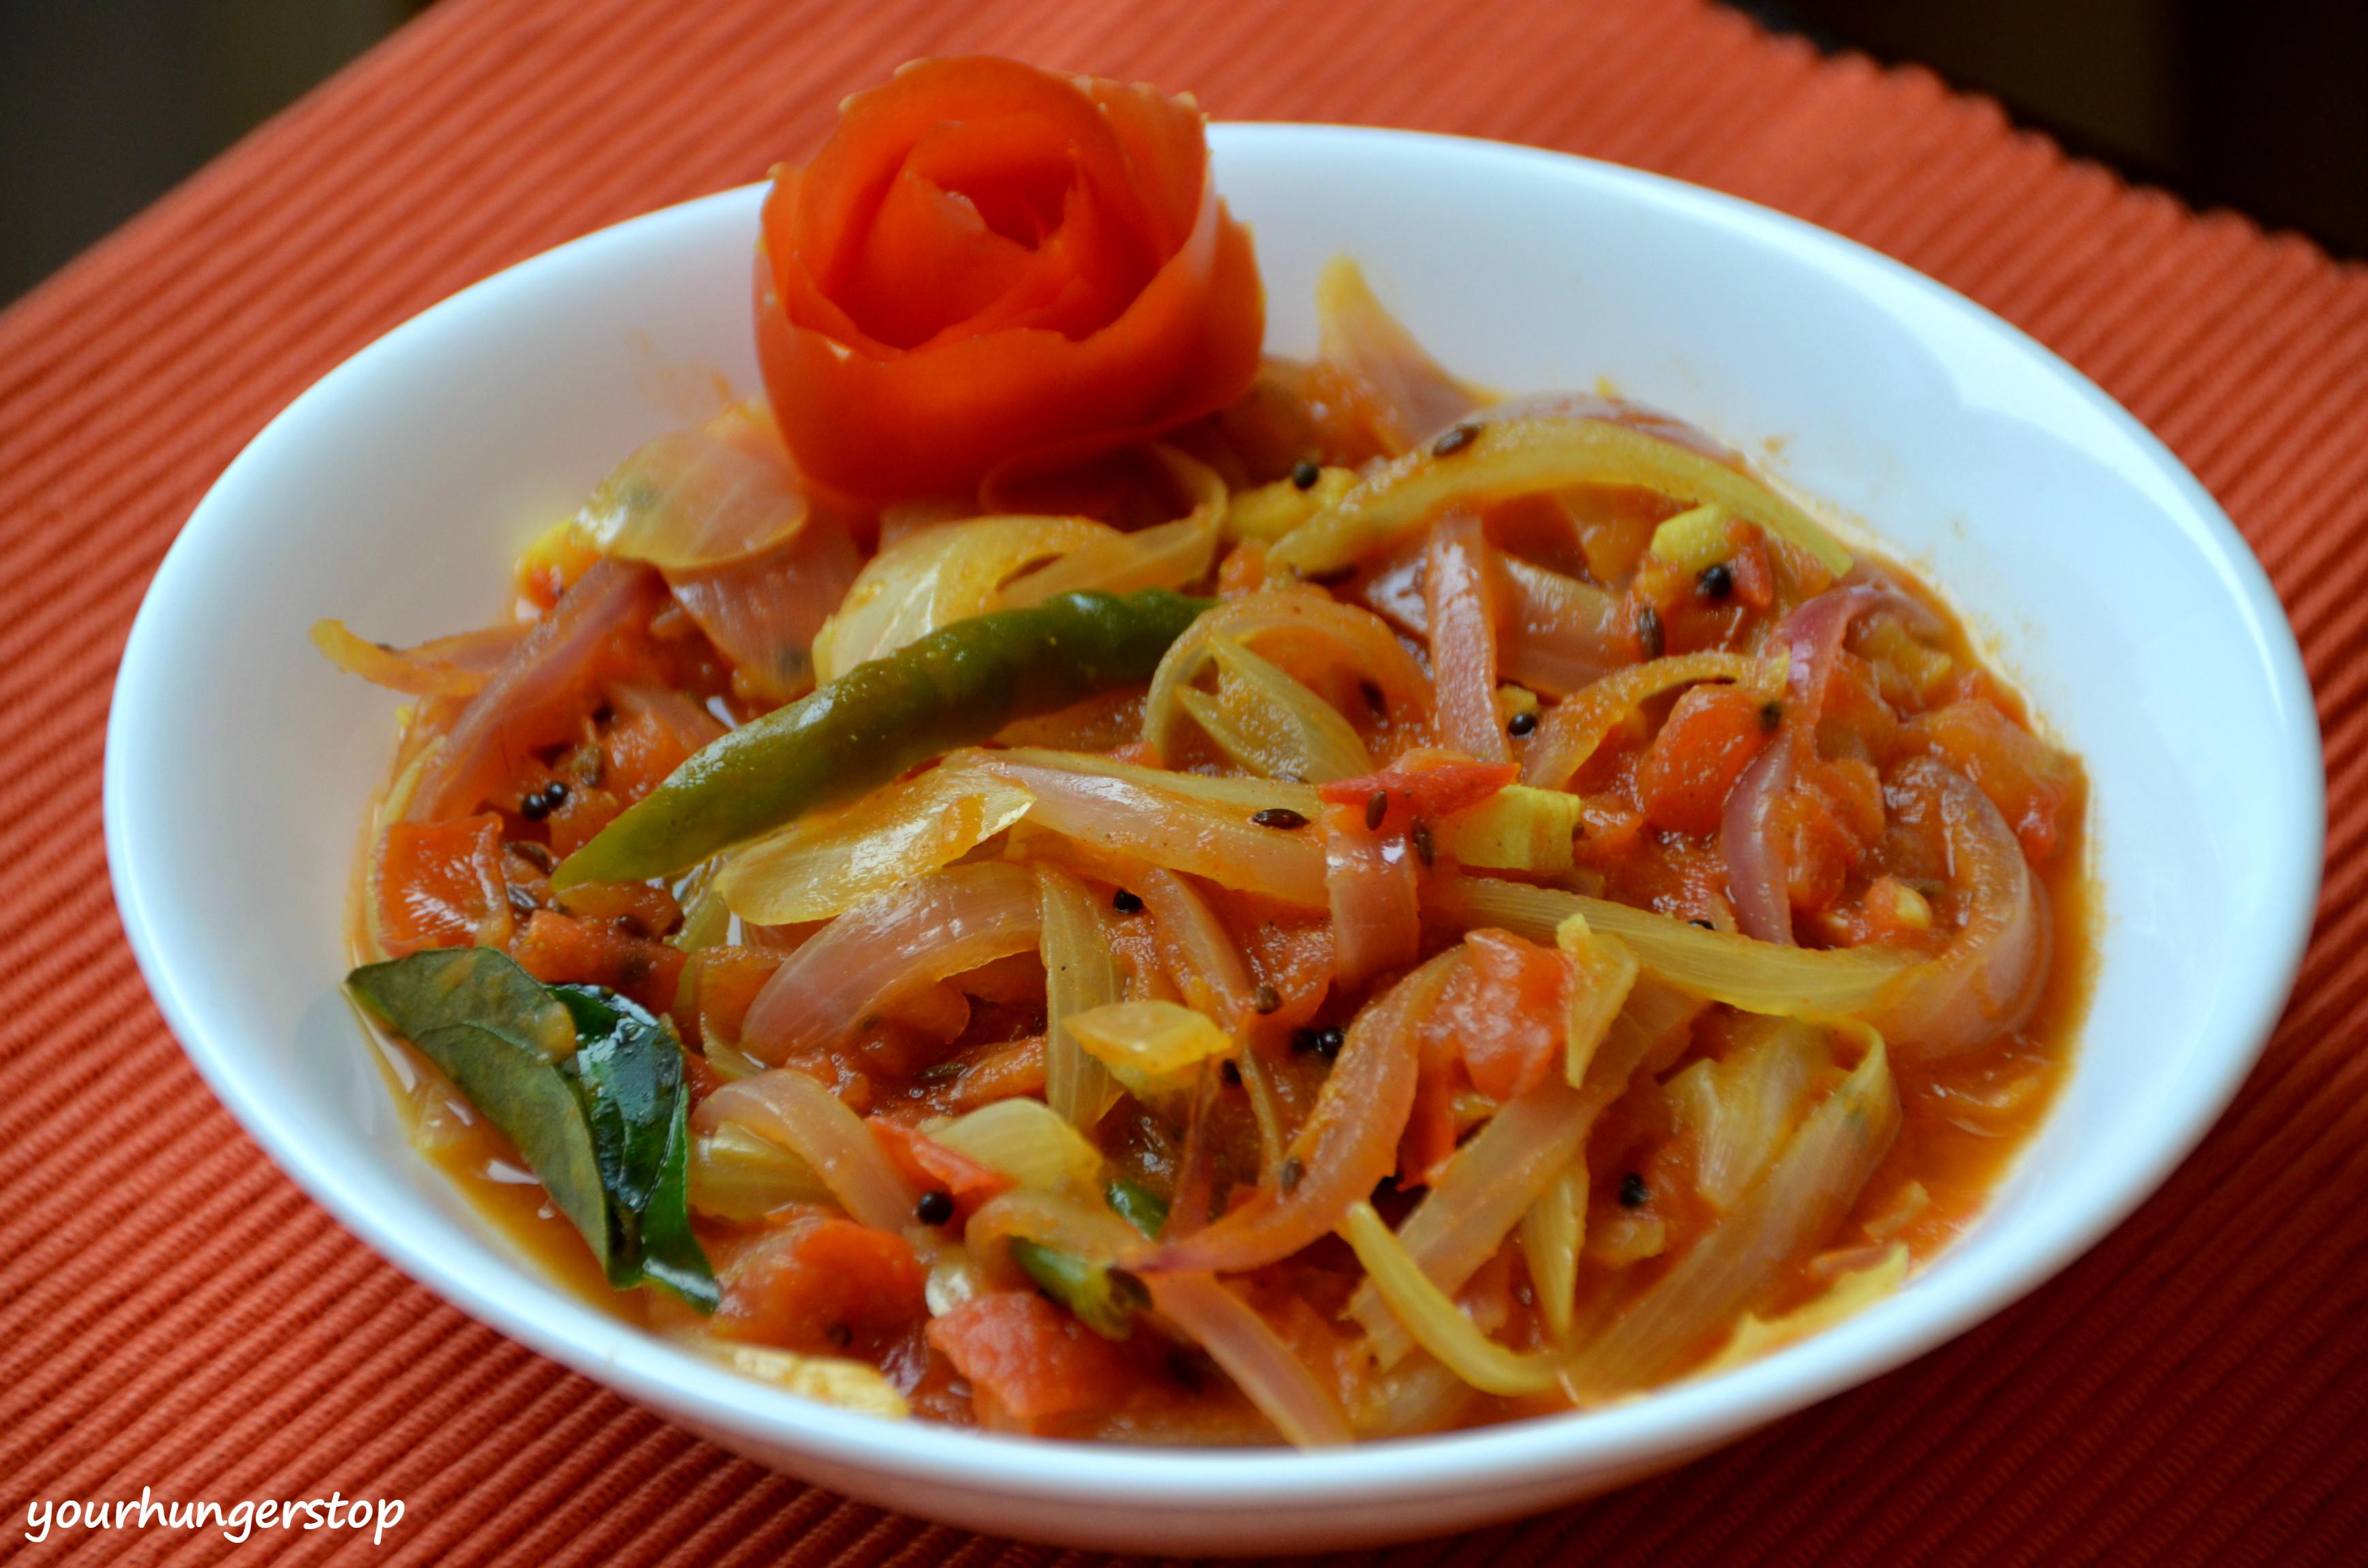 Tomato Bhaji Pyaz Tamatar Ki Sabzi Yourhungerstop